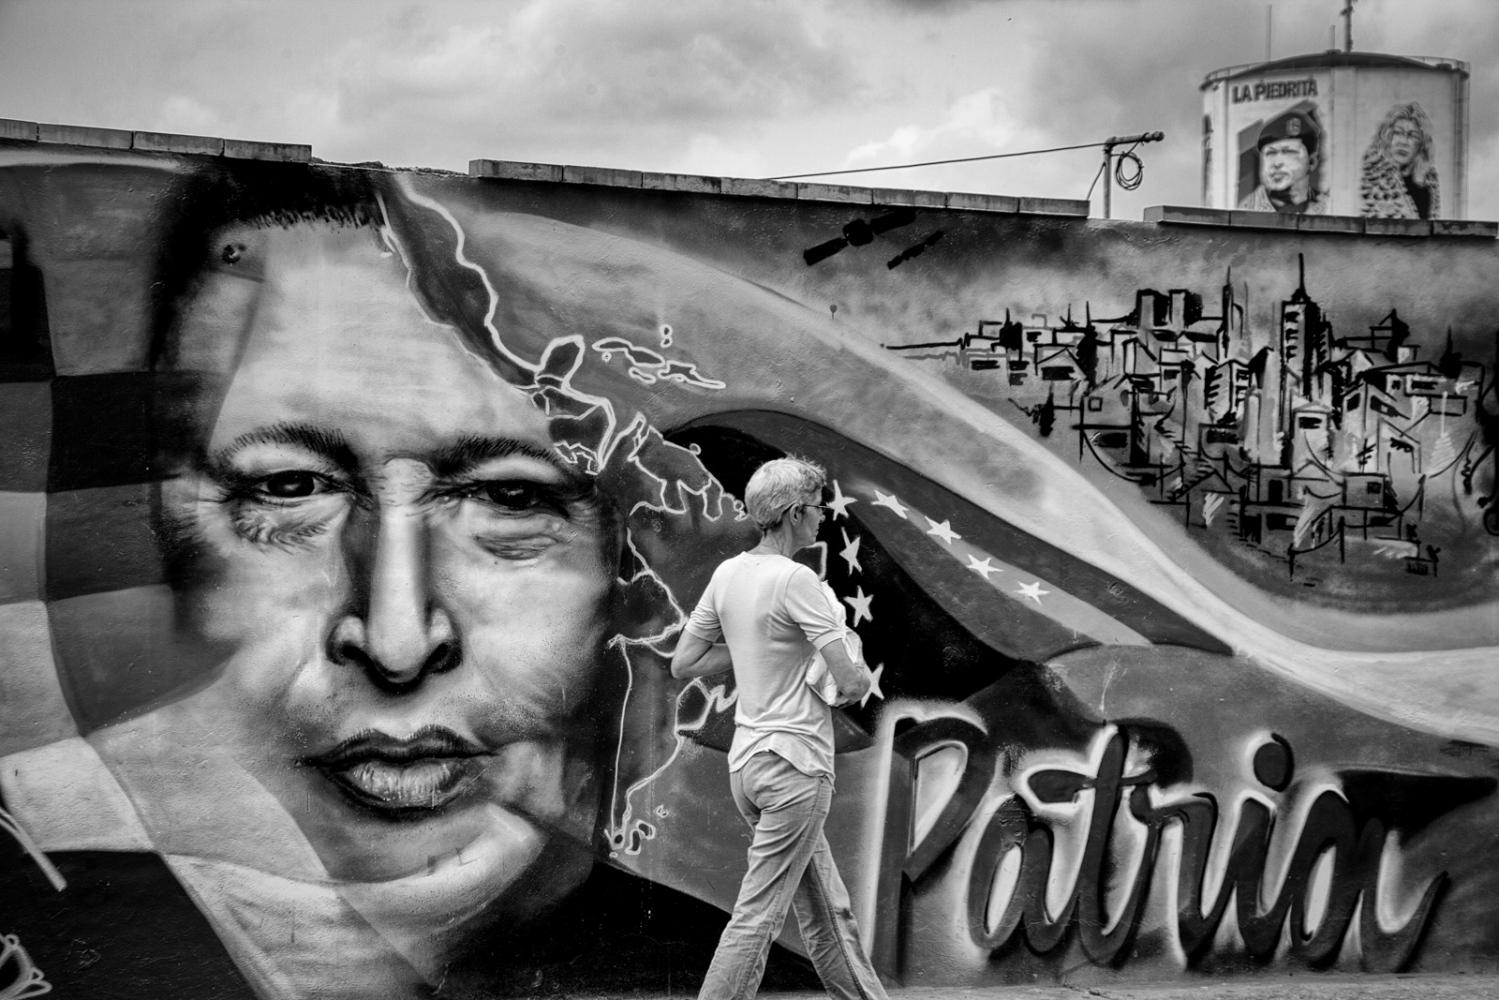 23 de Enero neighborhood is the bastion of Chavism. Here is Cuartel de la Montaña , that hosts the corpse of President Chávez.